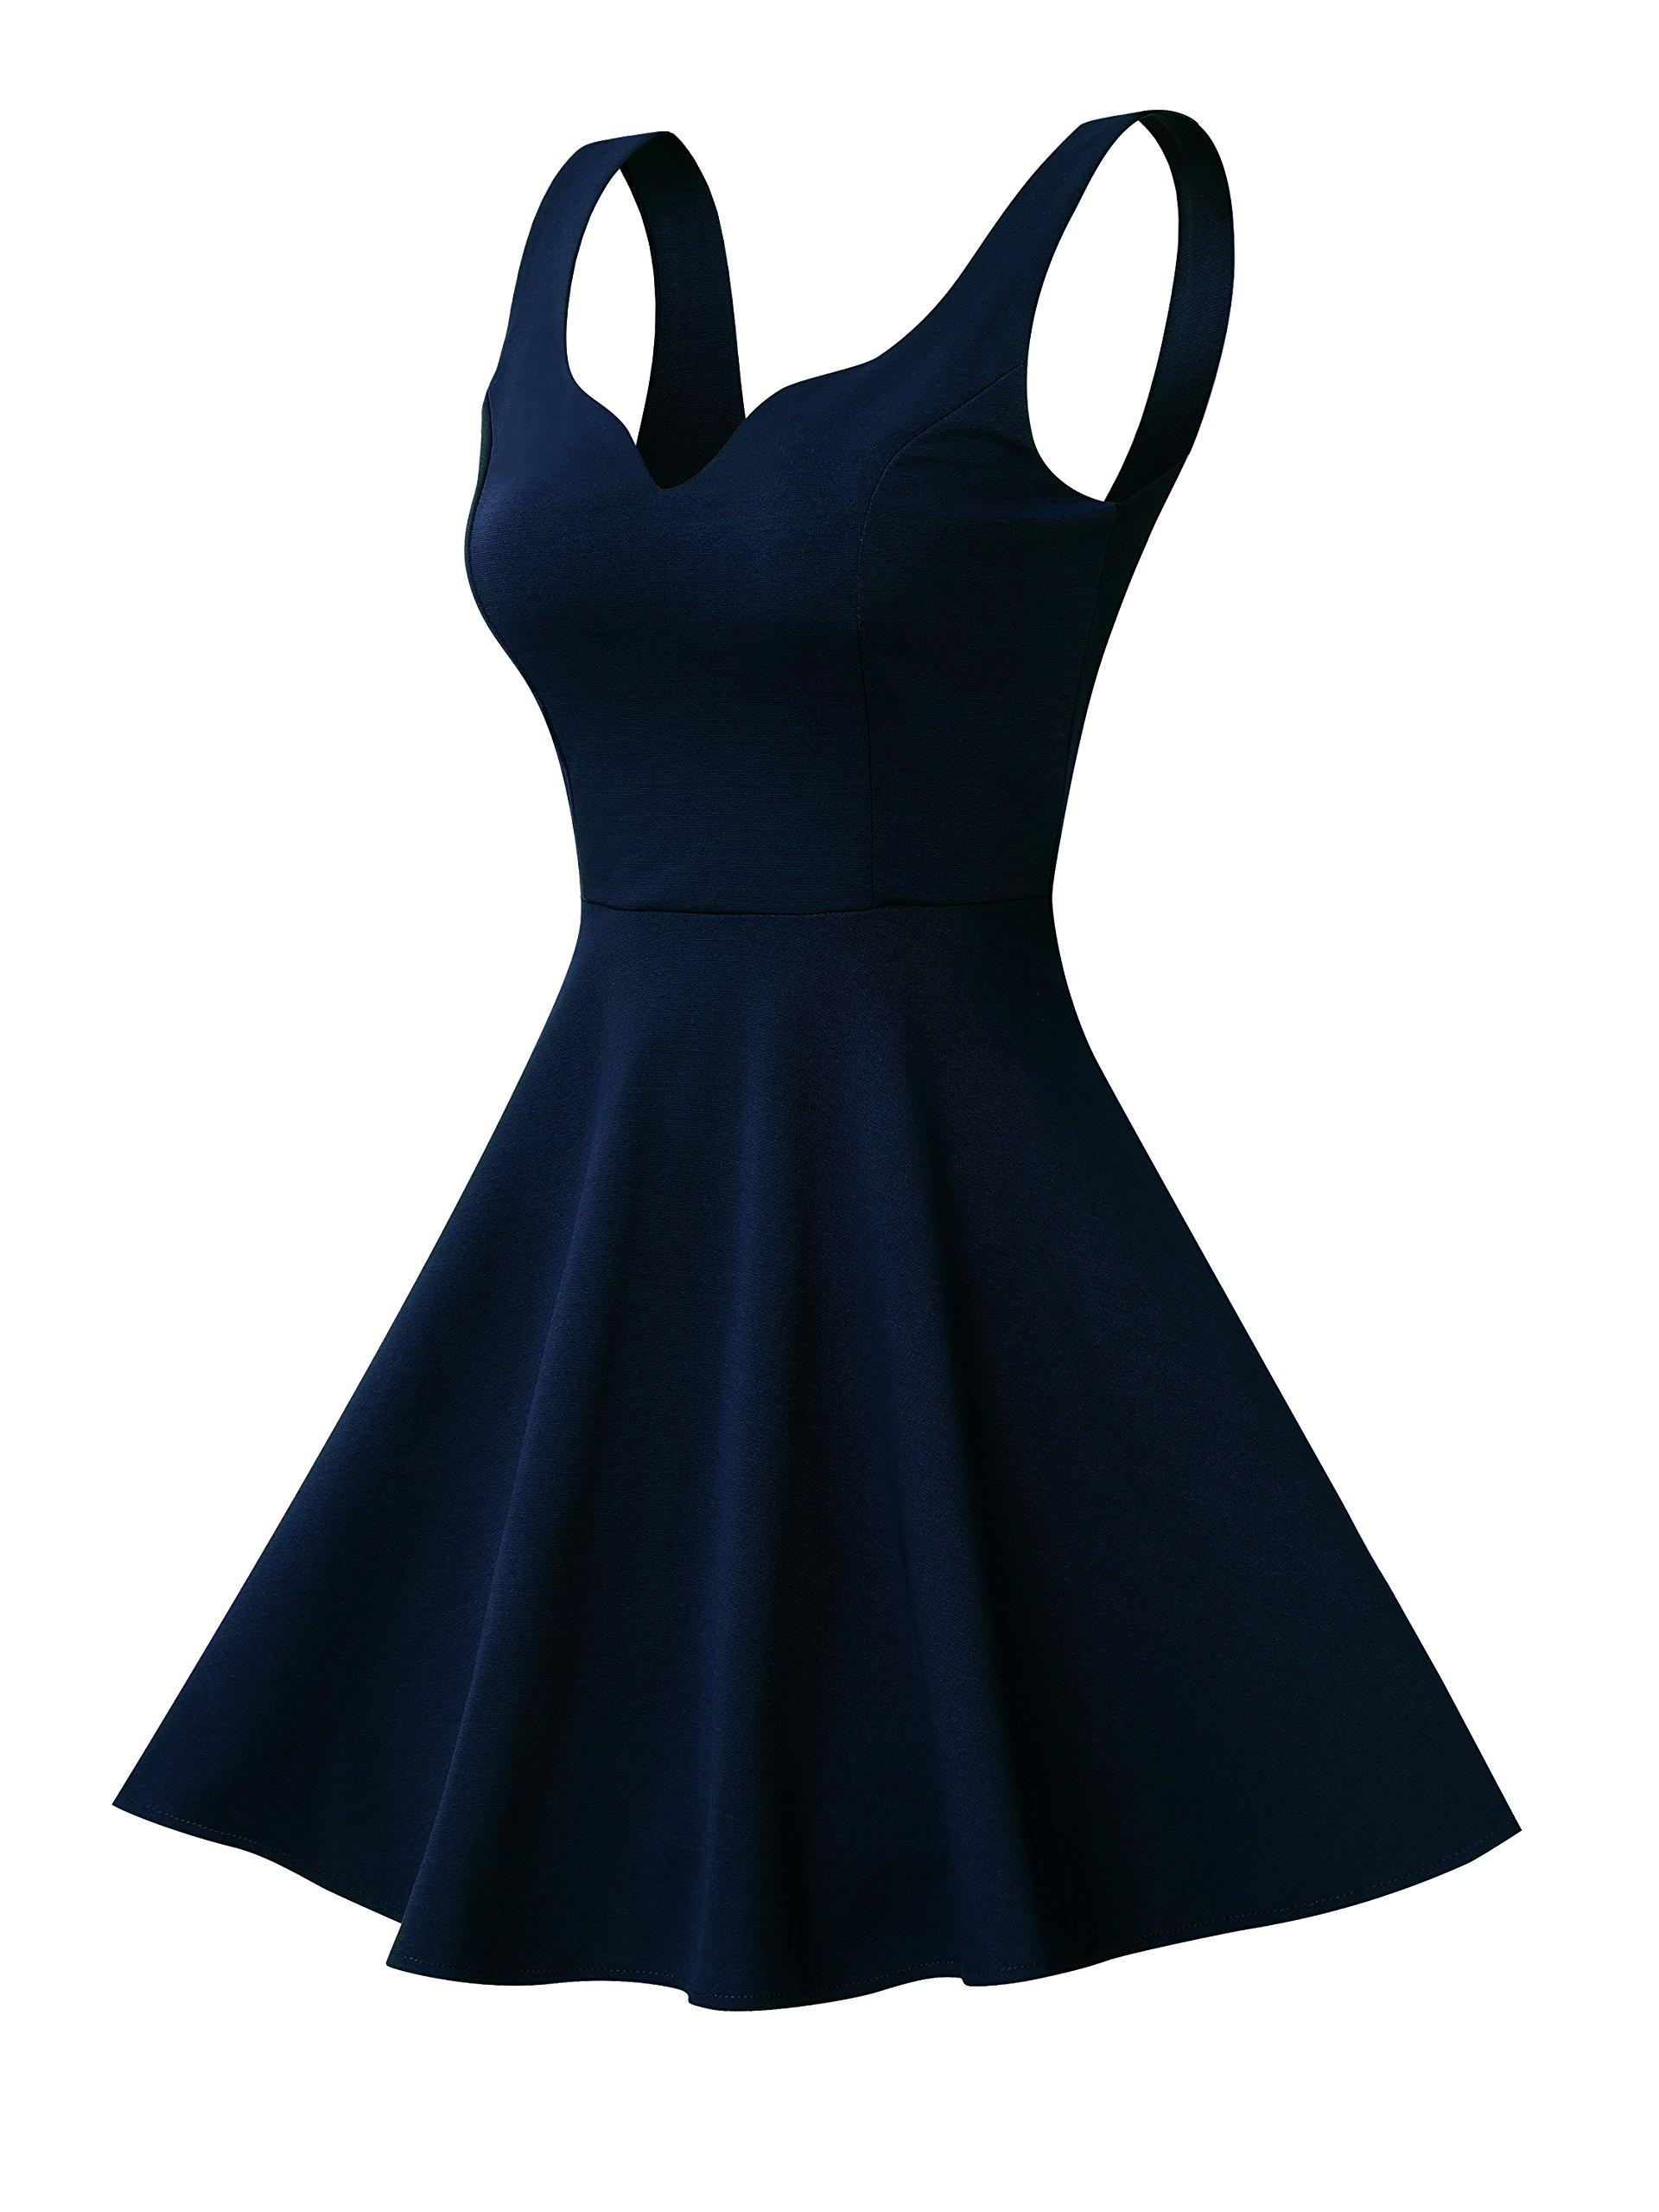 Missufe Women's Sleeveless Sweetheart Flared Mini Dress (M, 01-Navy Blue) by Missufe